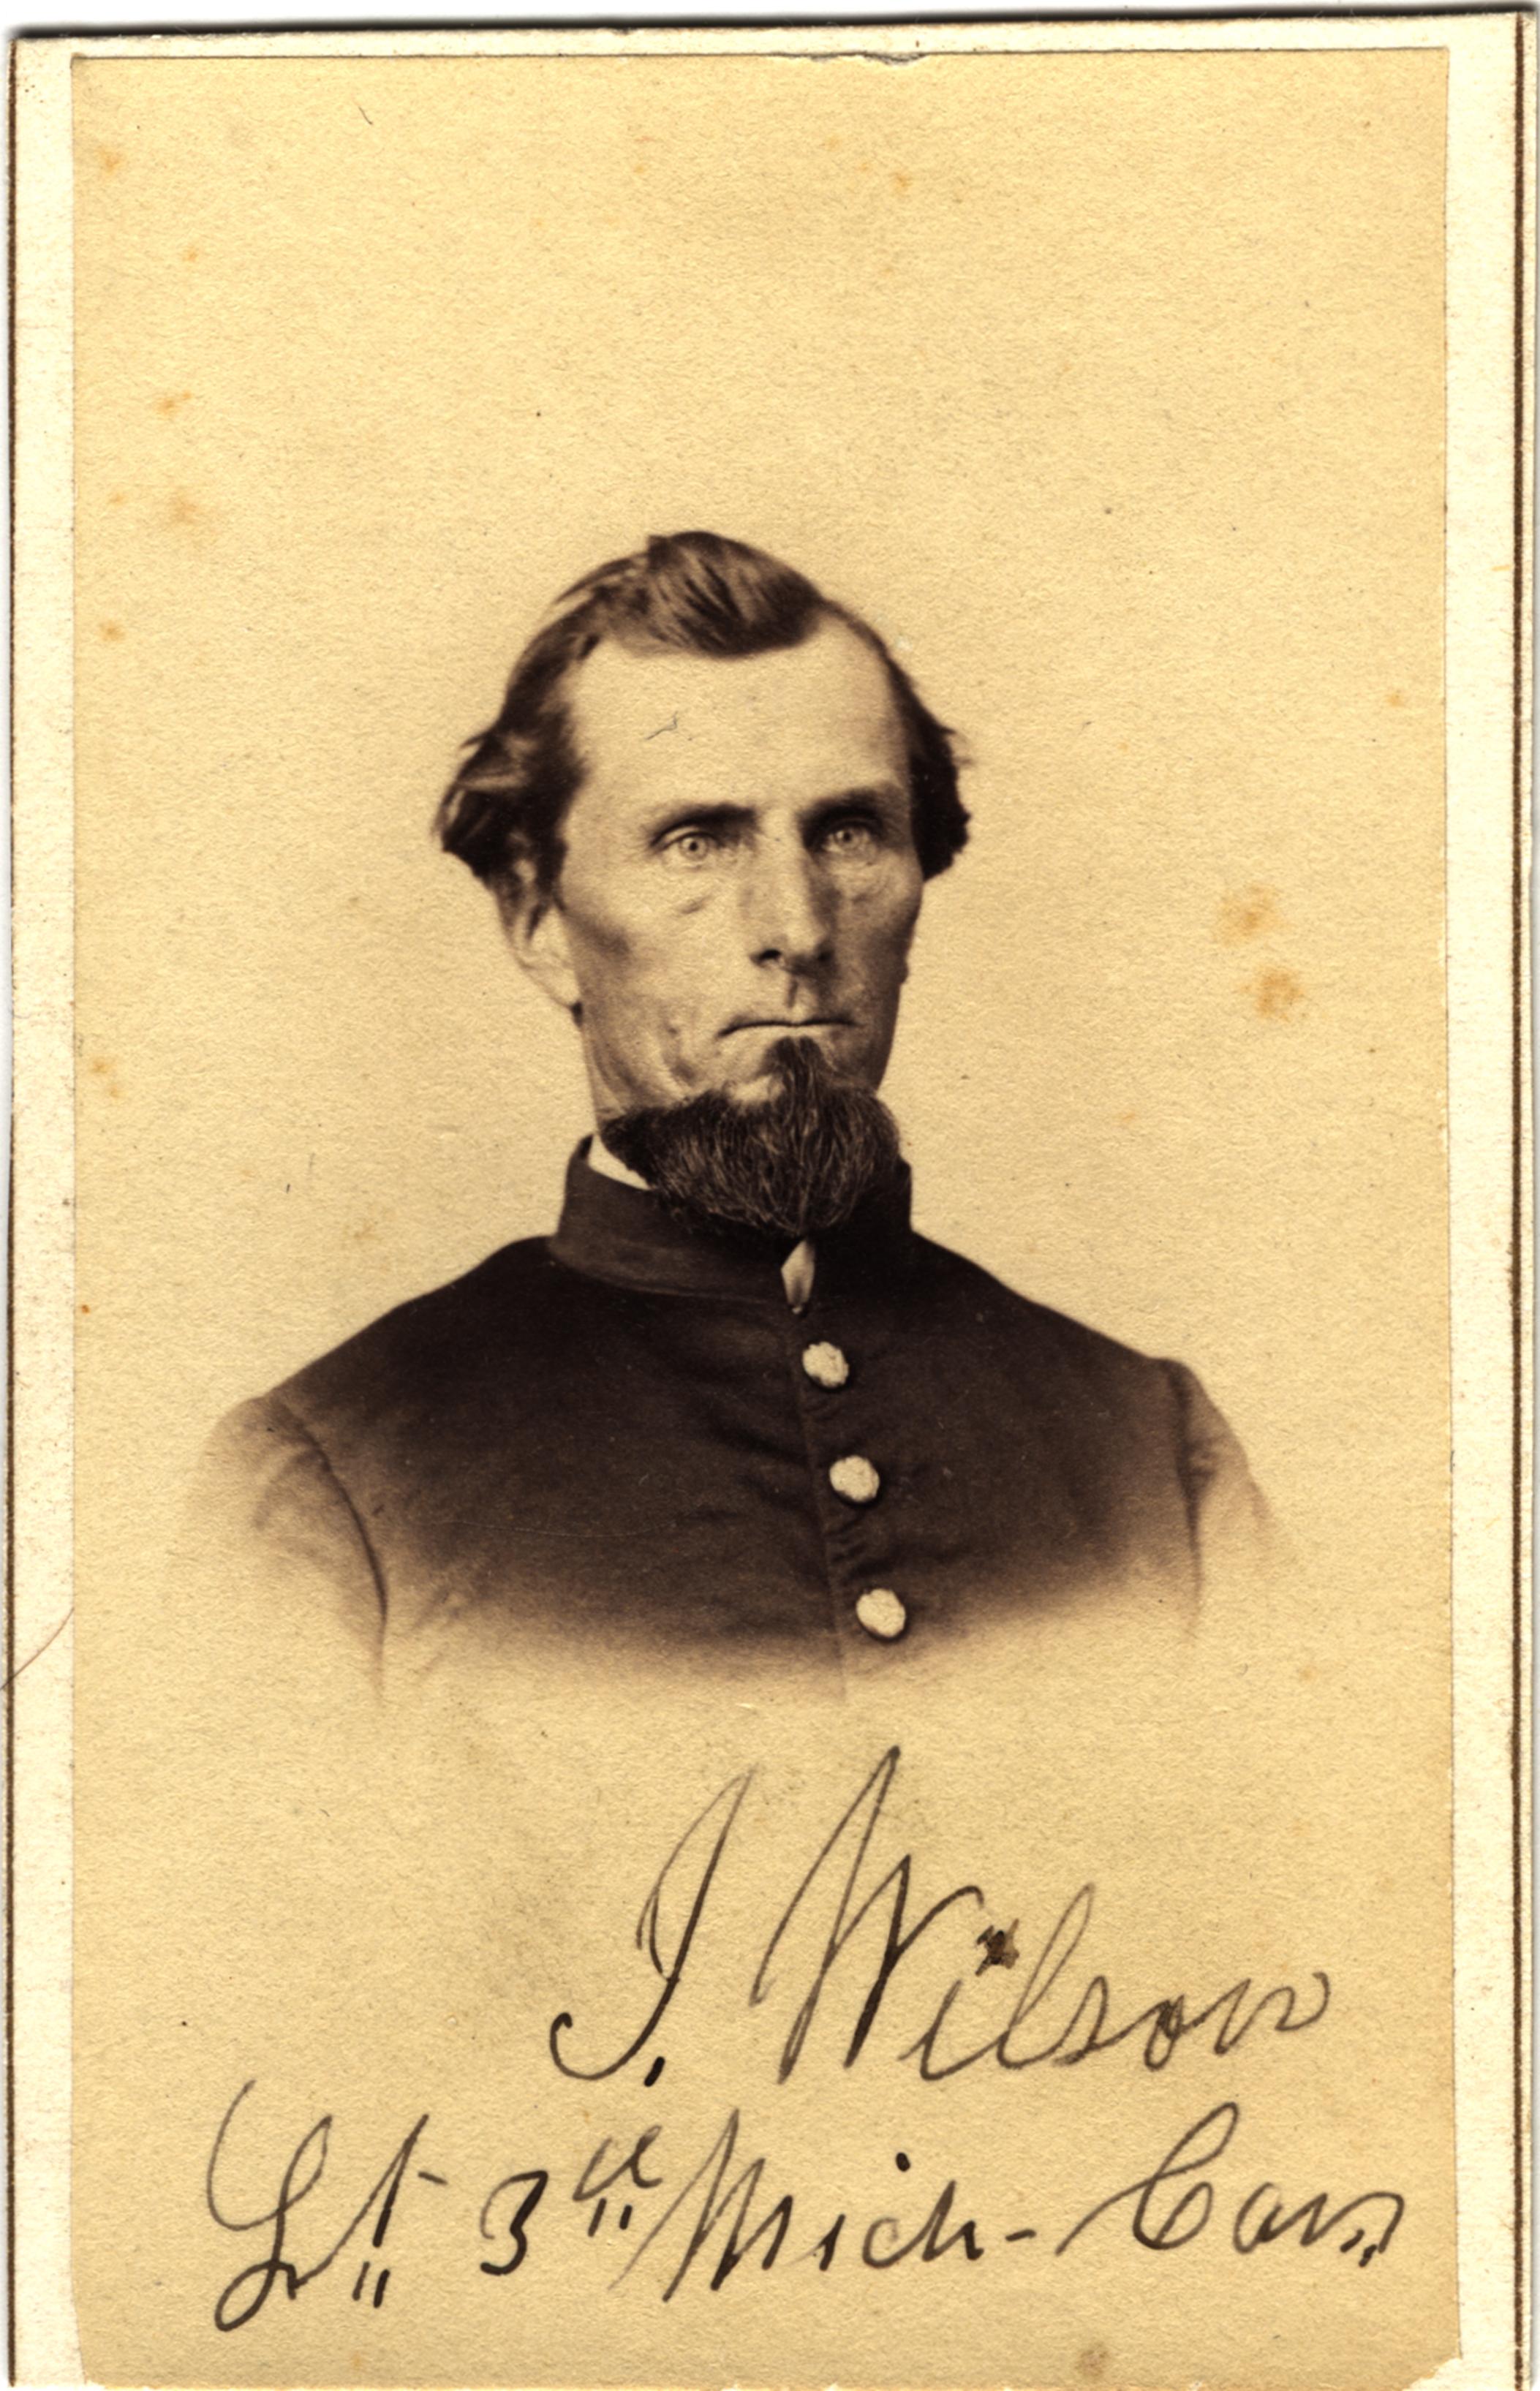 Isaac Wilson, circa 1860s